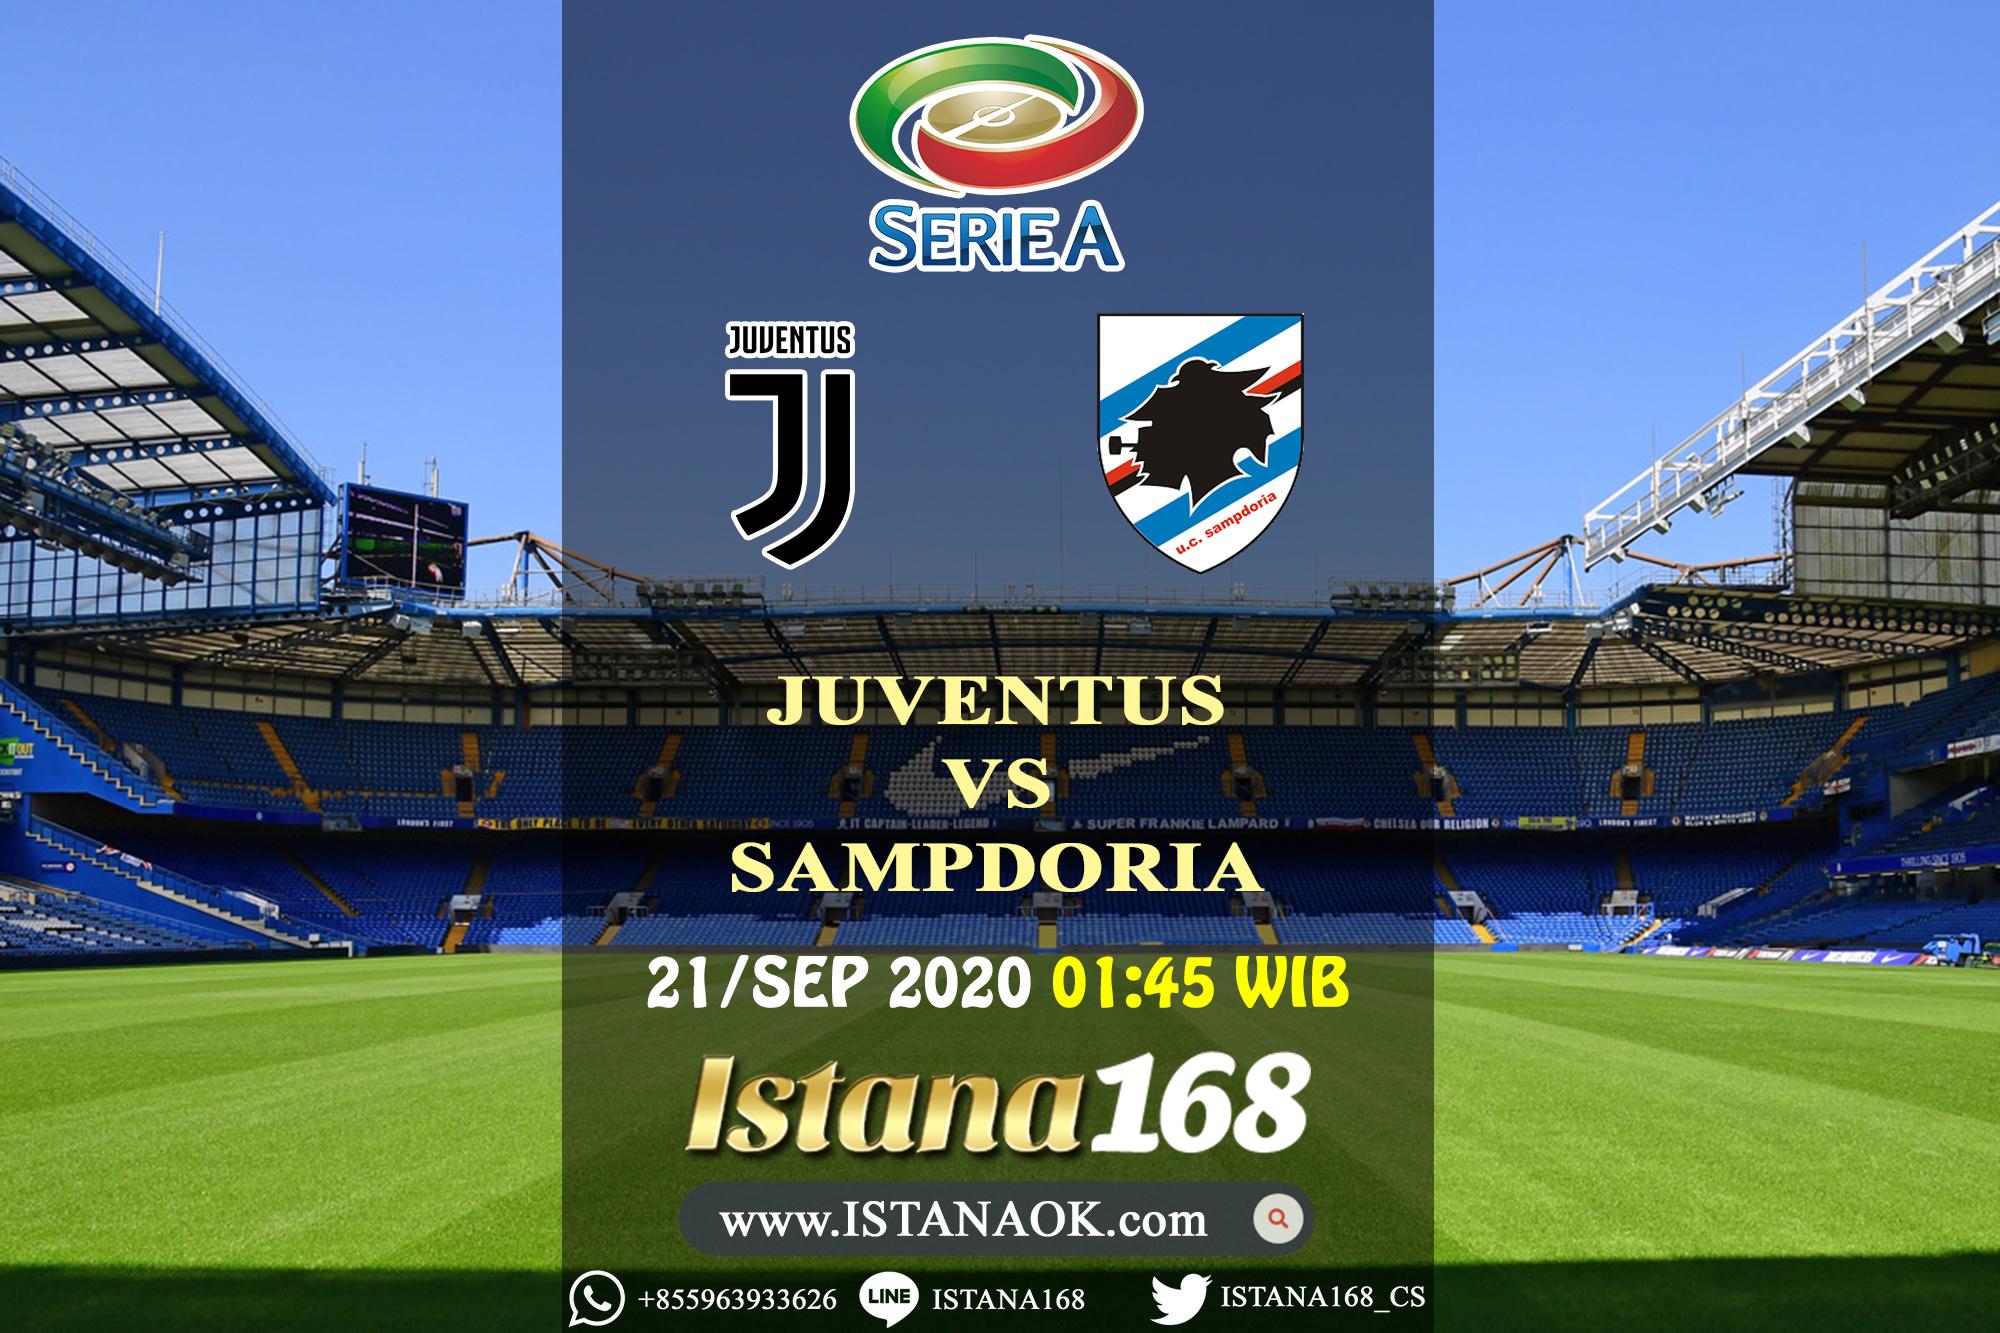 Prediksi Bola Akurat Istana168 Juventus VS Sampdoria 21 September 2020